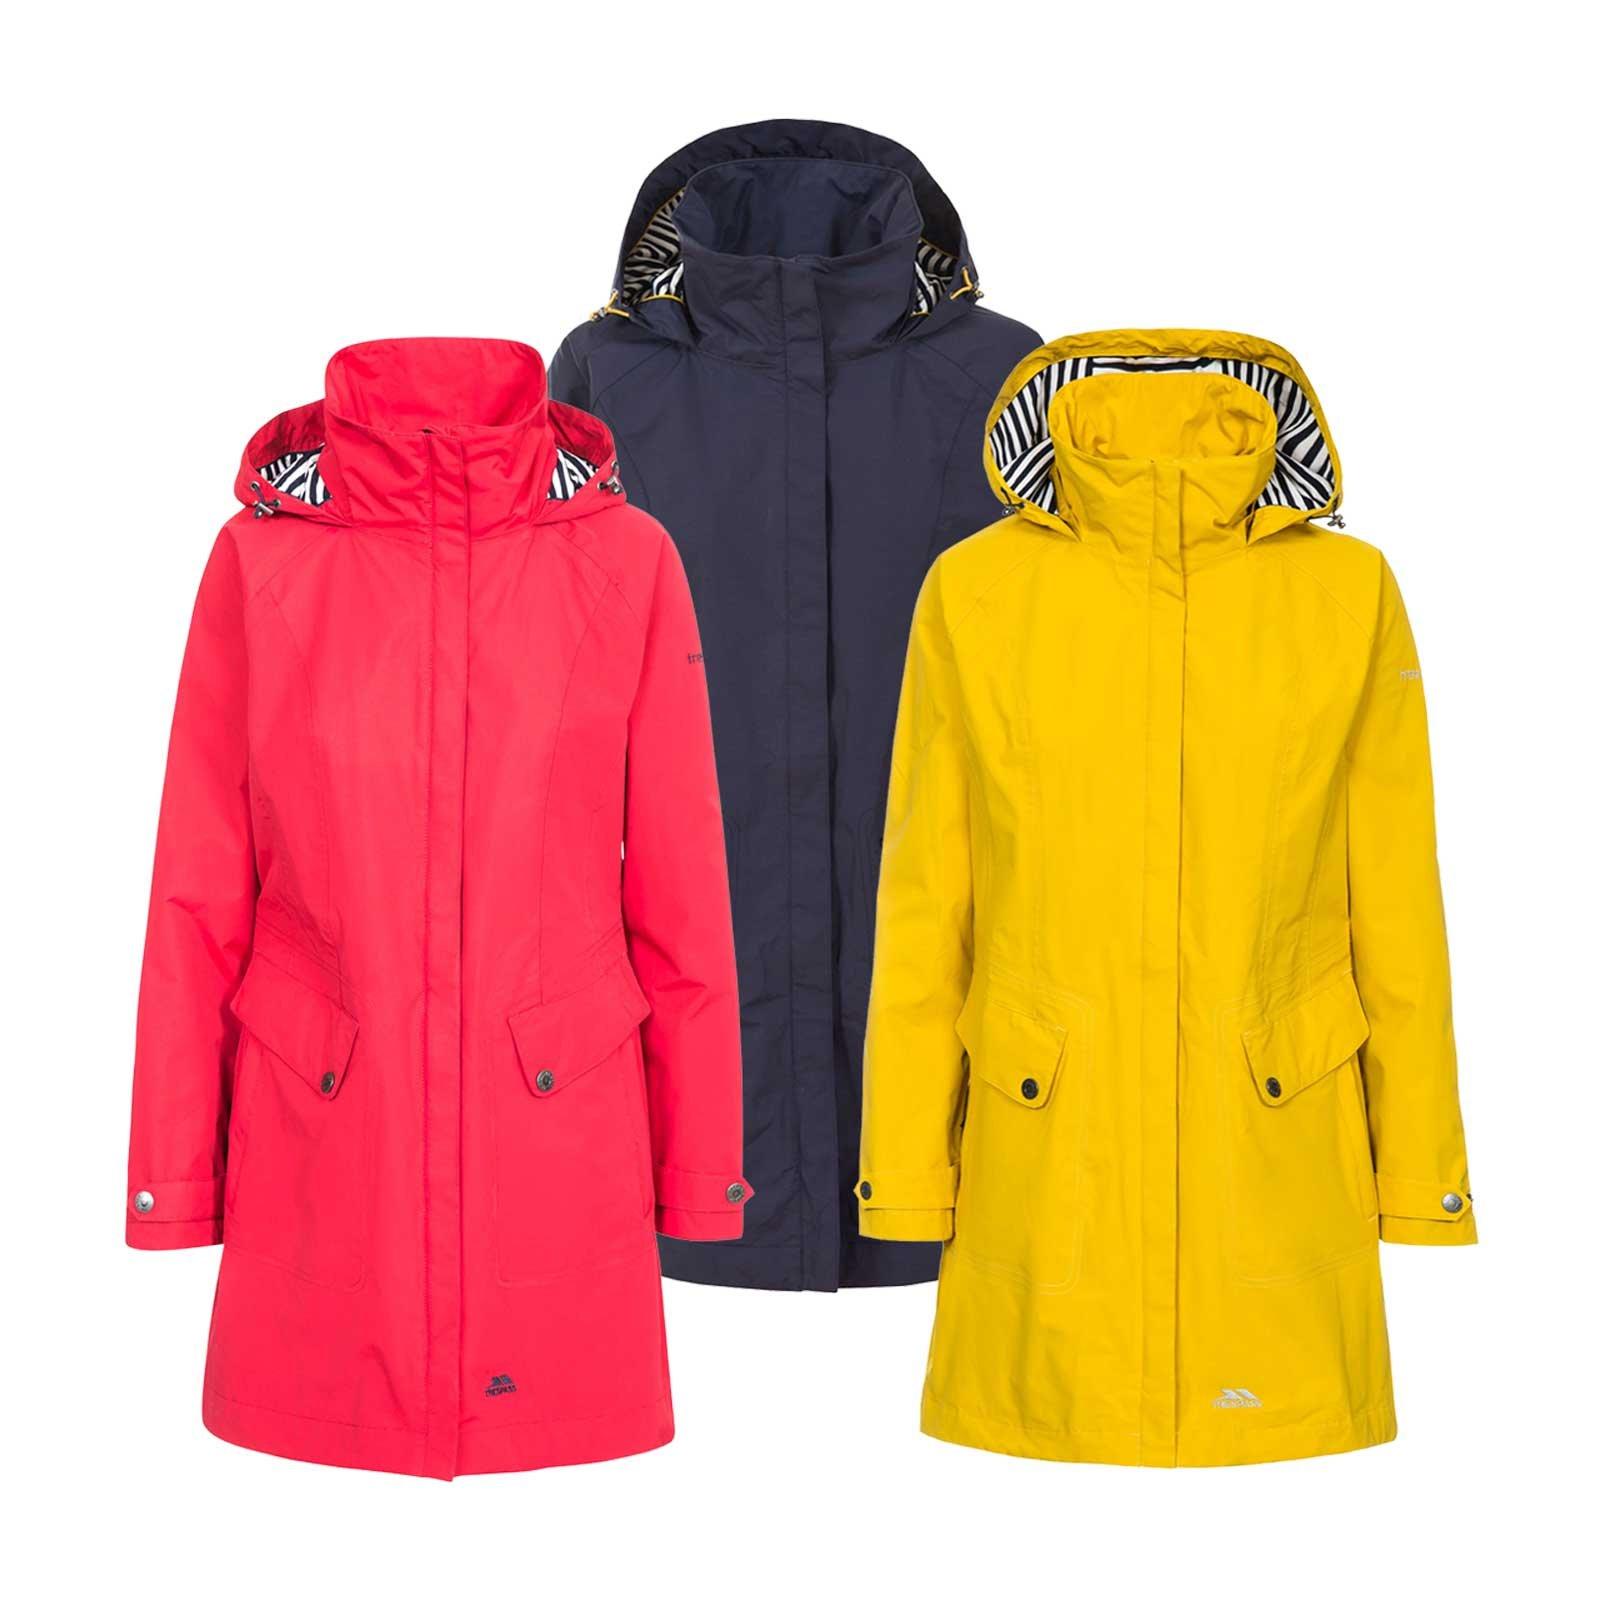 4776aef425b Trespass Women's Rainy Day Waterproof Rain Jacket with Concealed Hood